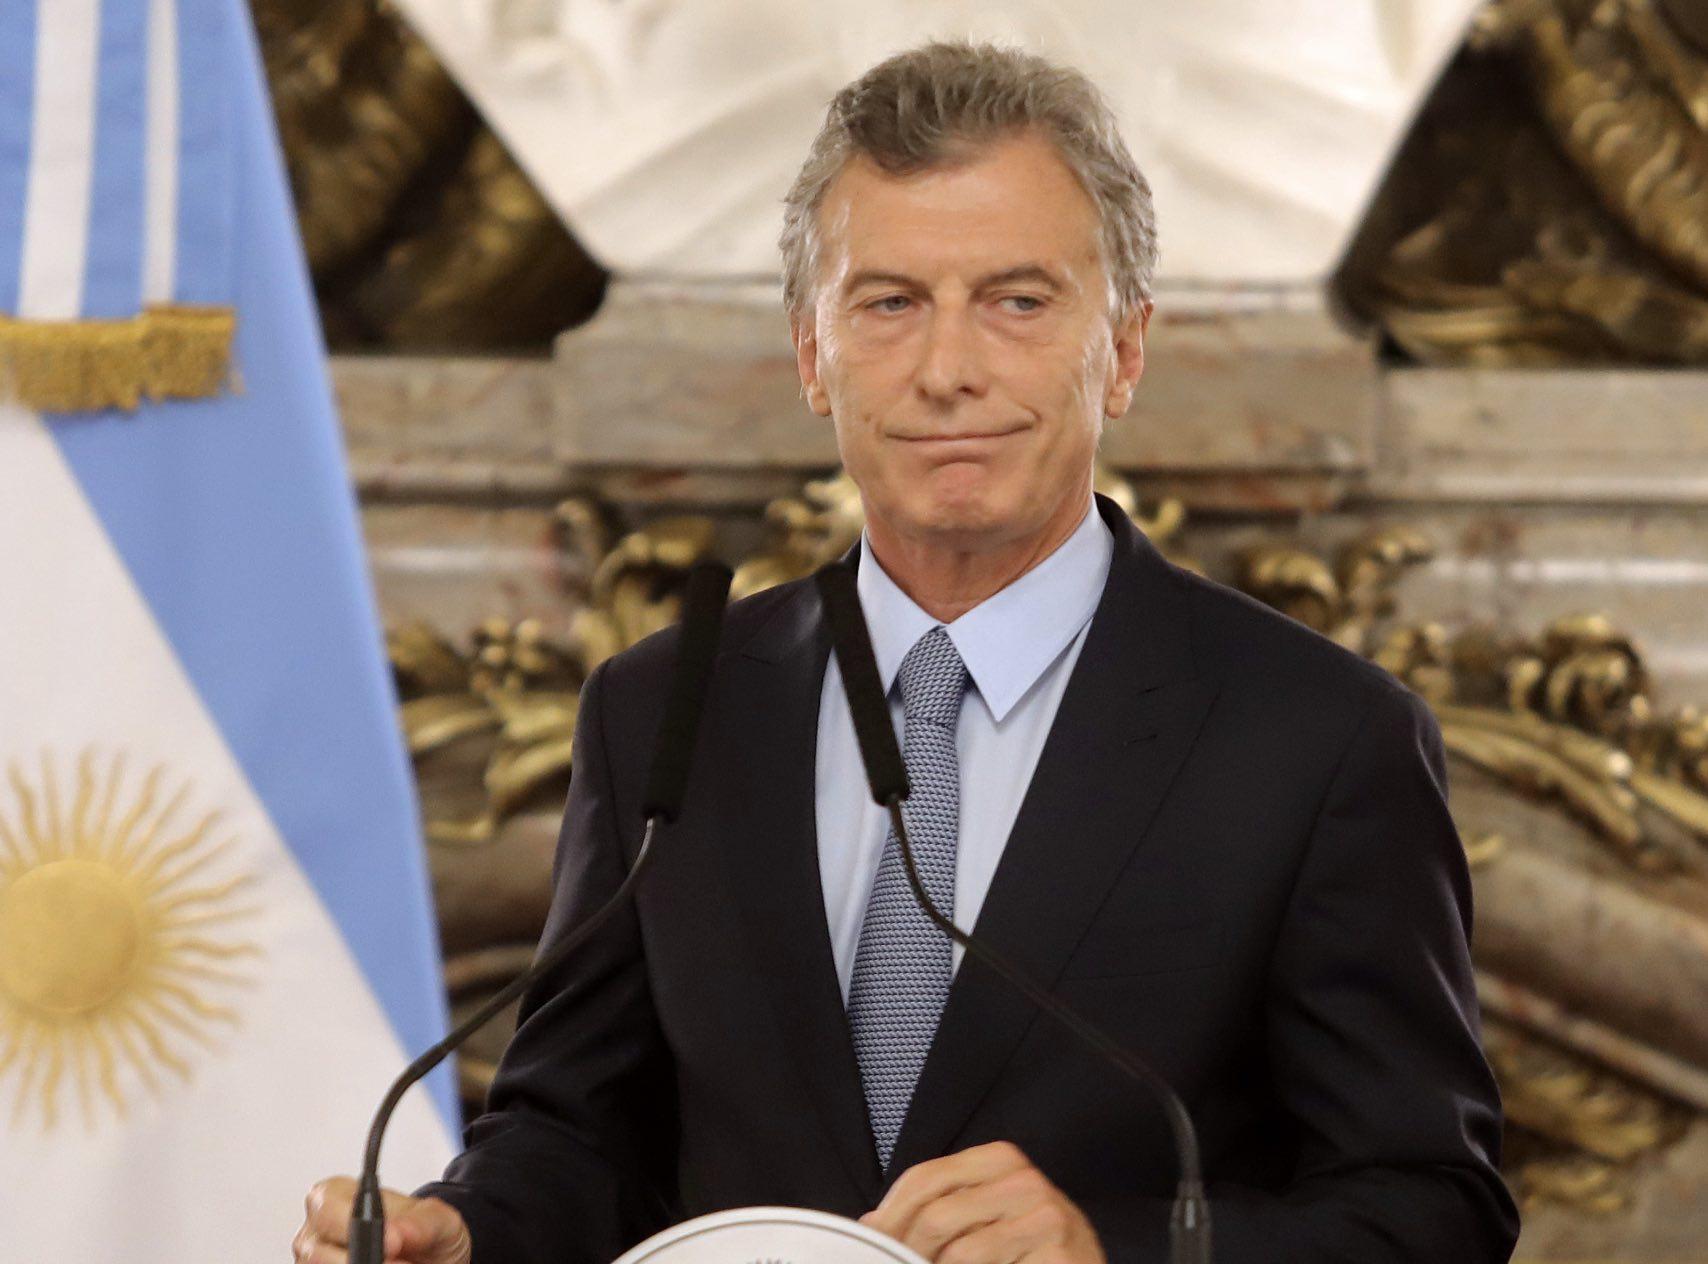 Mauricio Macri, Libremercado, Estado gigante, Liberalismo económico, Progresismo, Gasto público